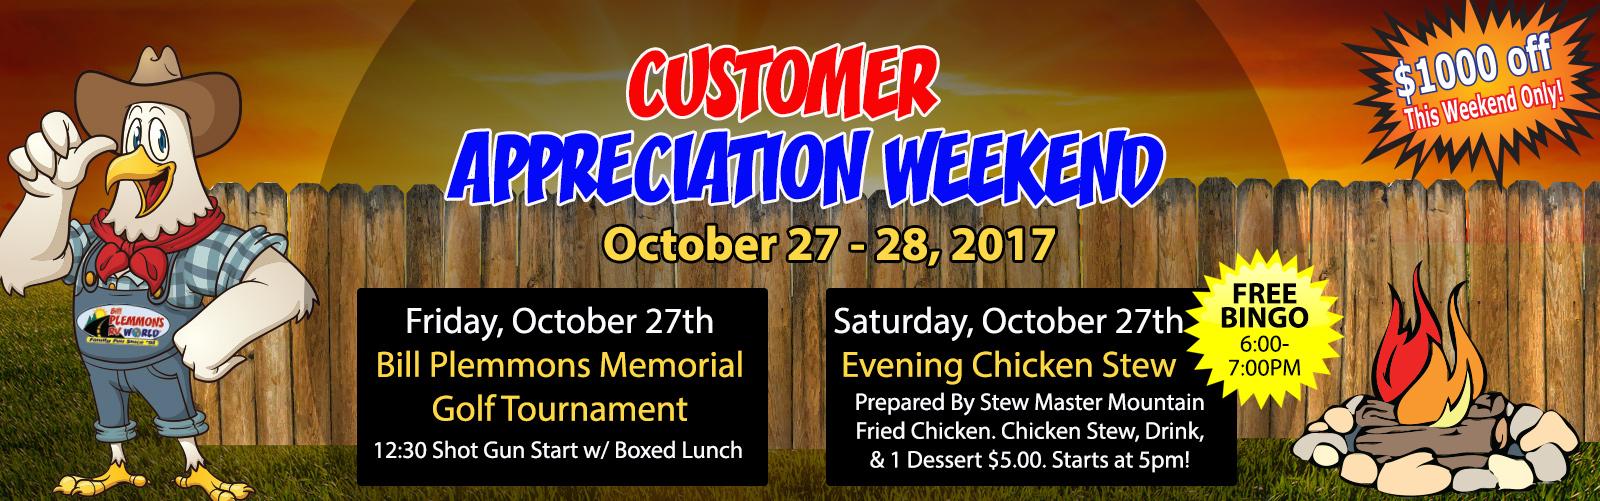 Bill Plemmons Chick Stew Customer Appreciation Sale